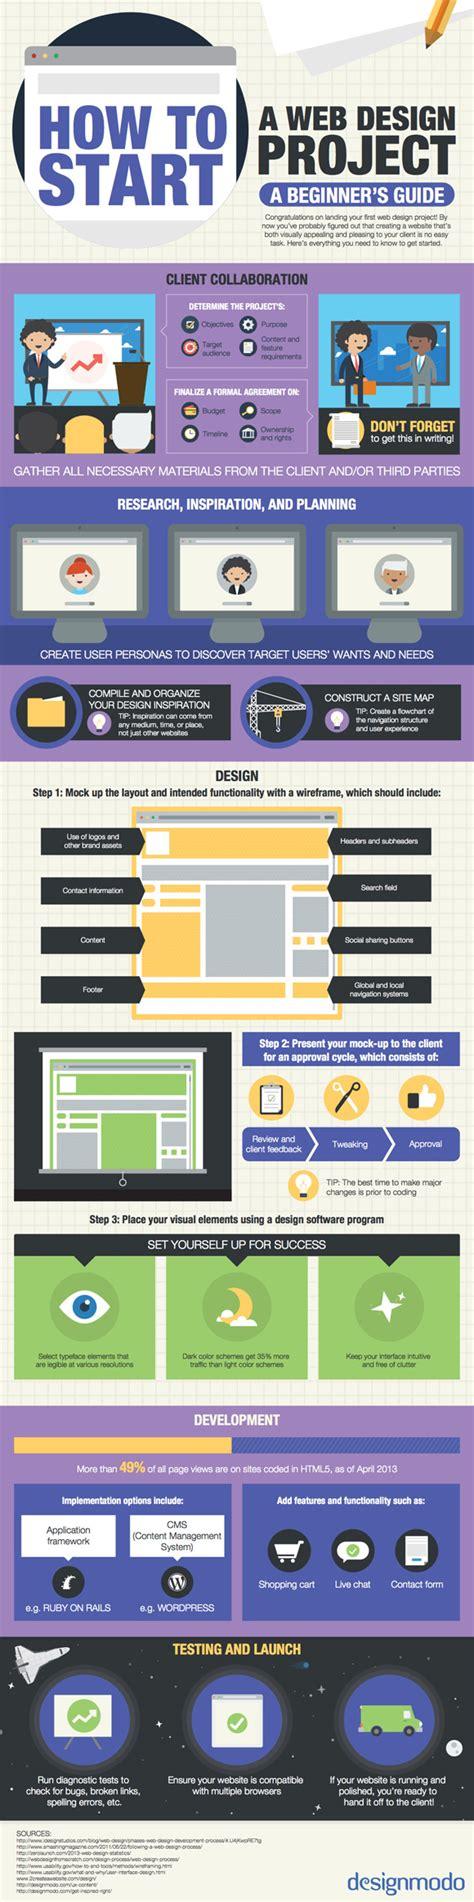 website layout guide 20 useful web design infographics tips tricks